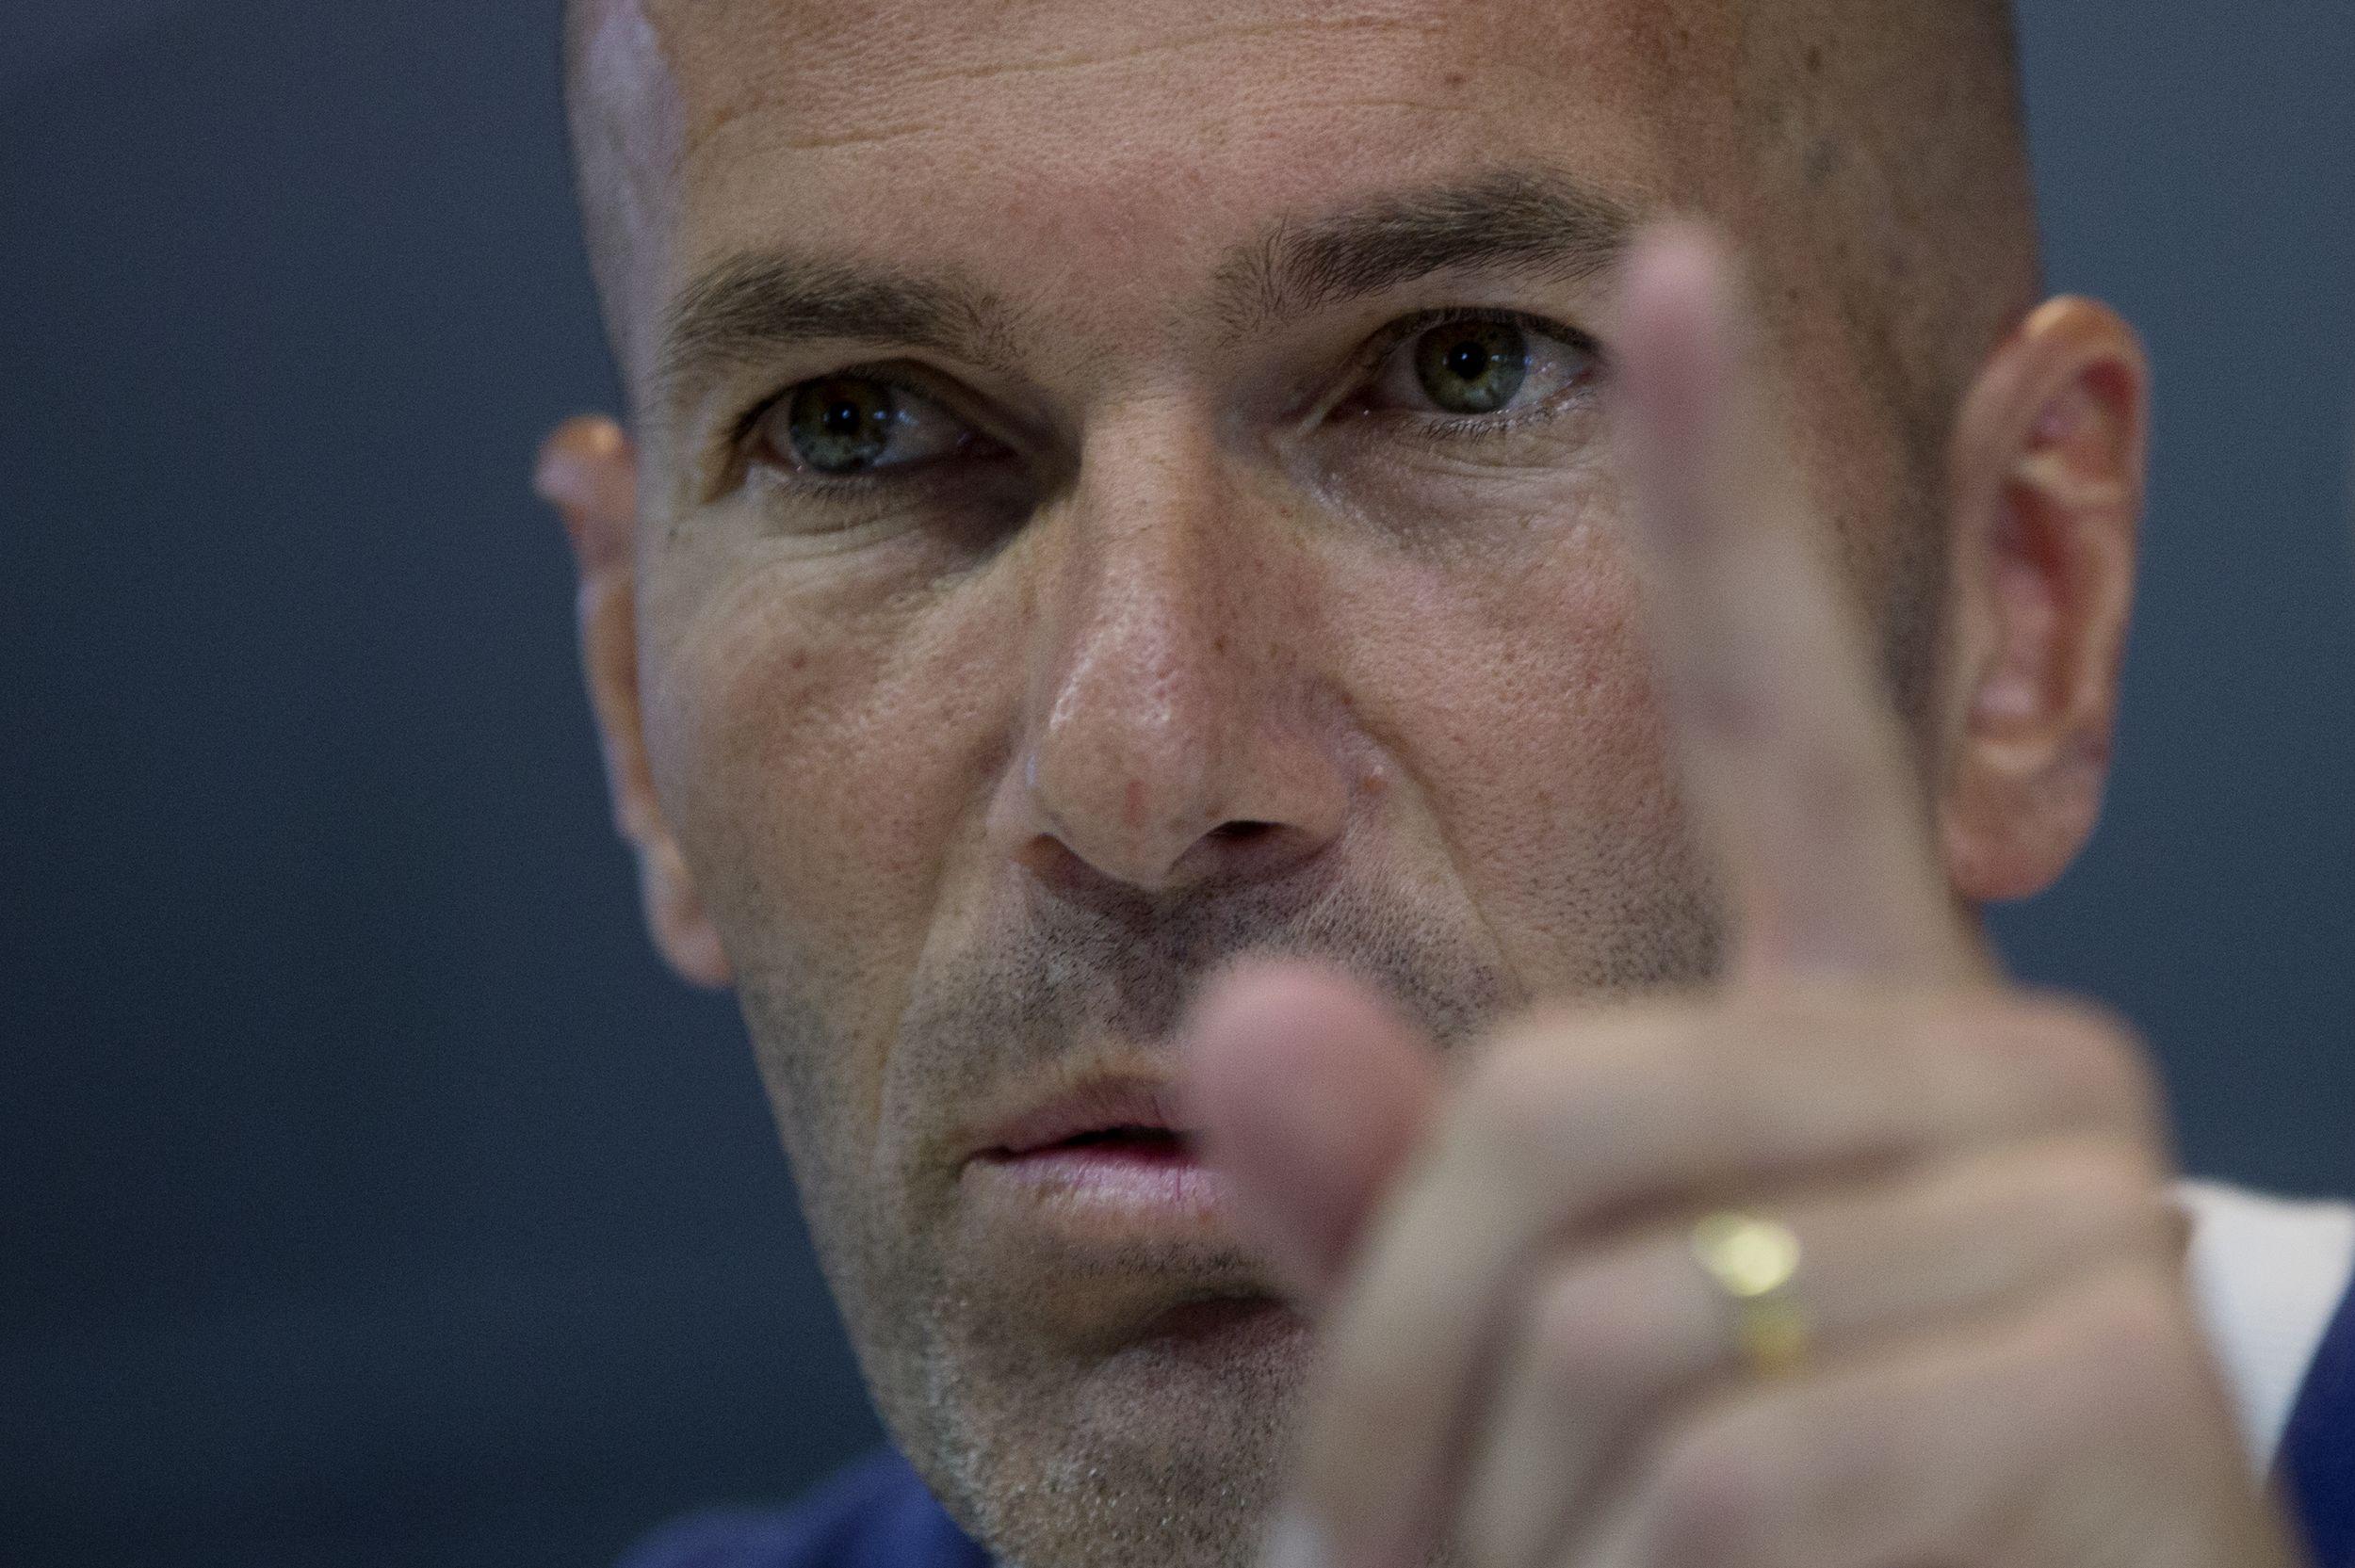 Football - Etranger - La sortie de Ronaldo, symbole de l'autorité de Zidane au Real